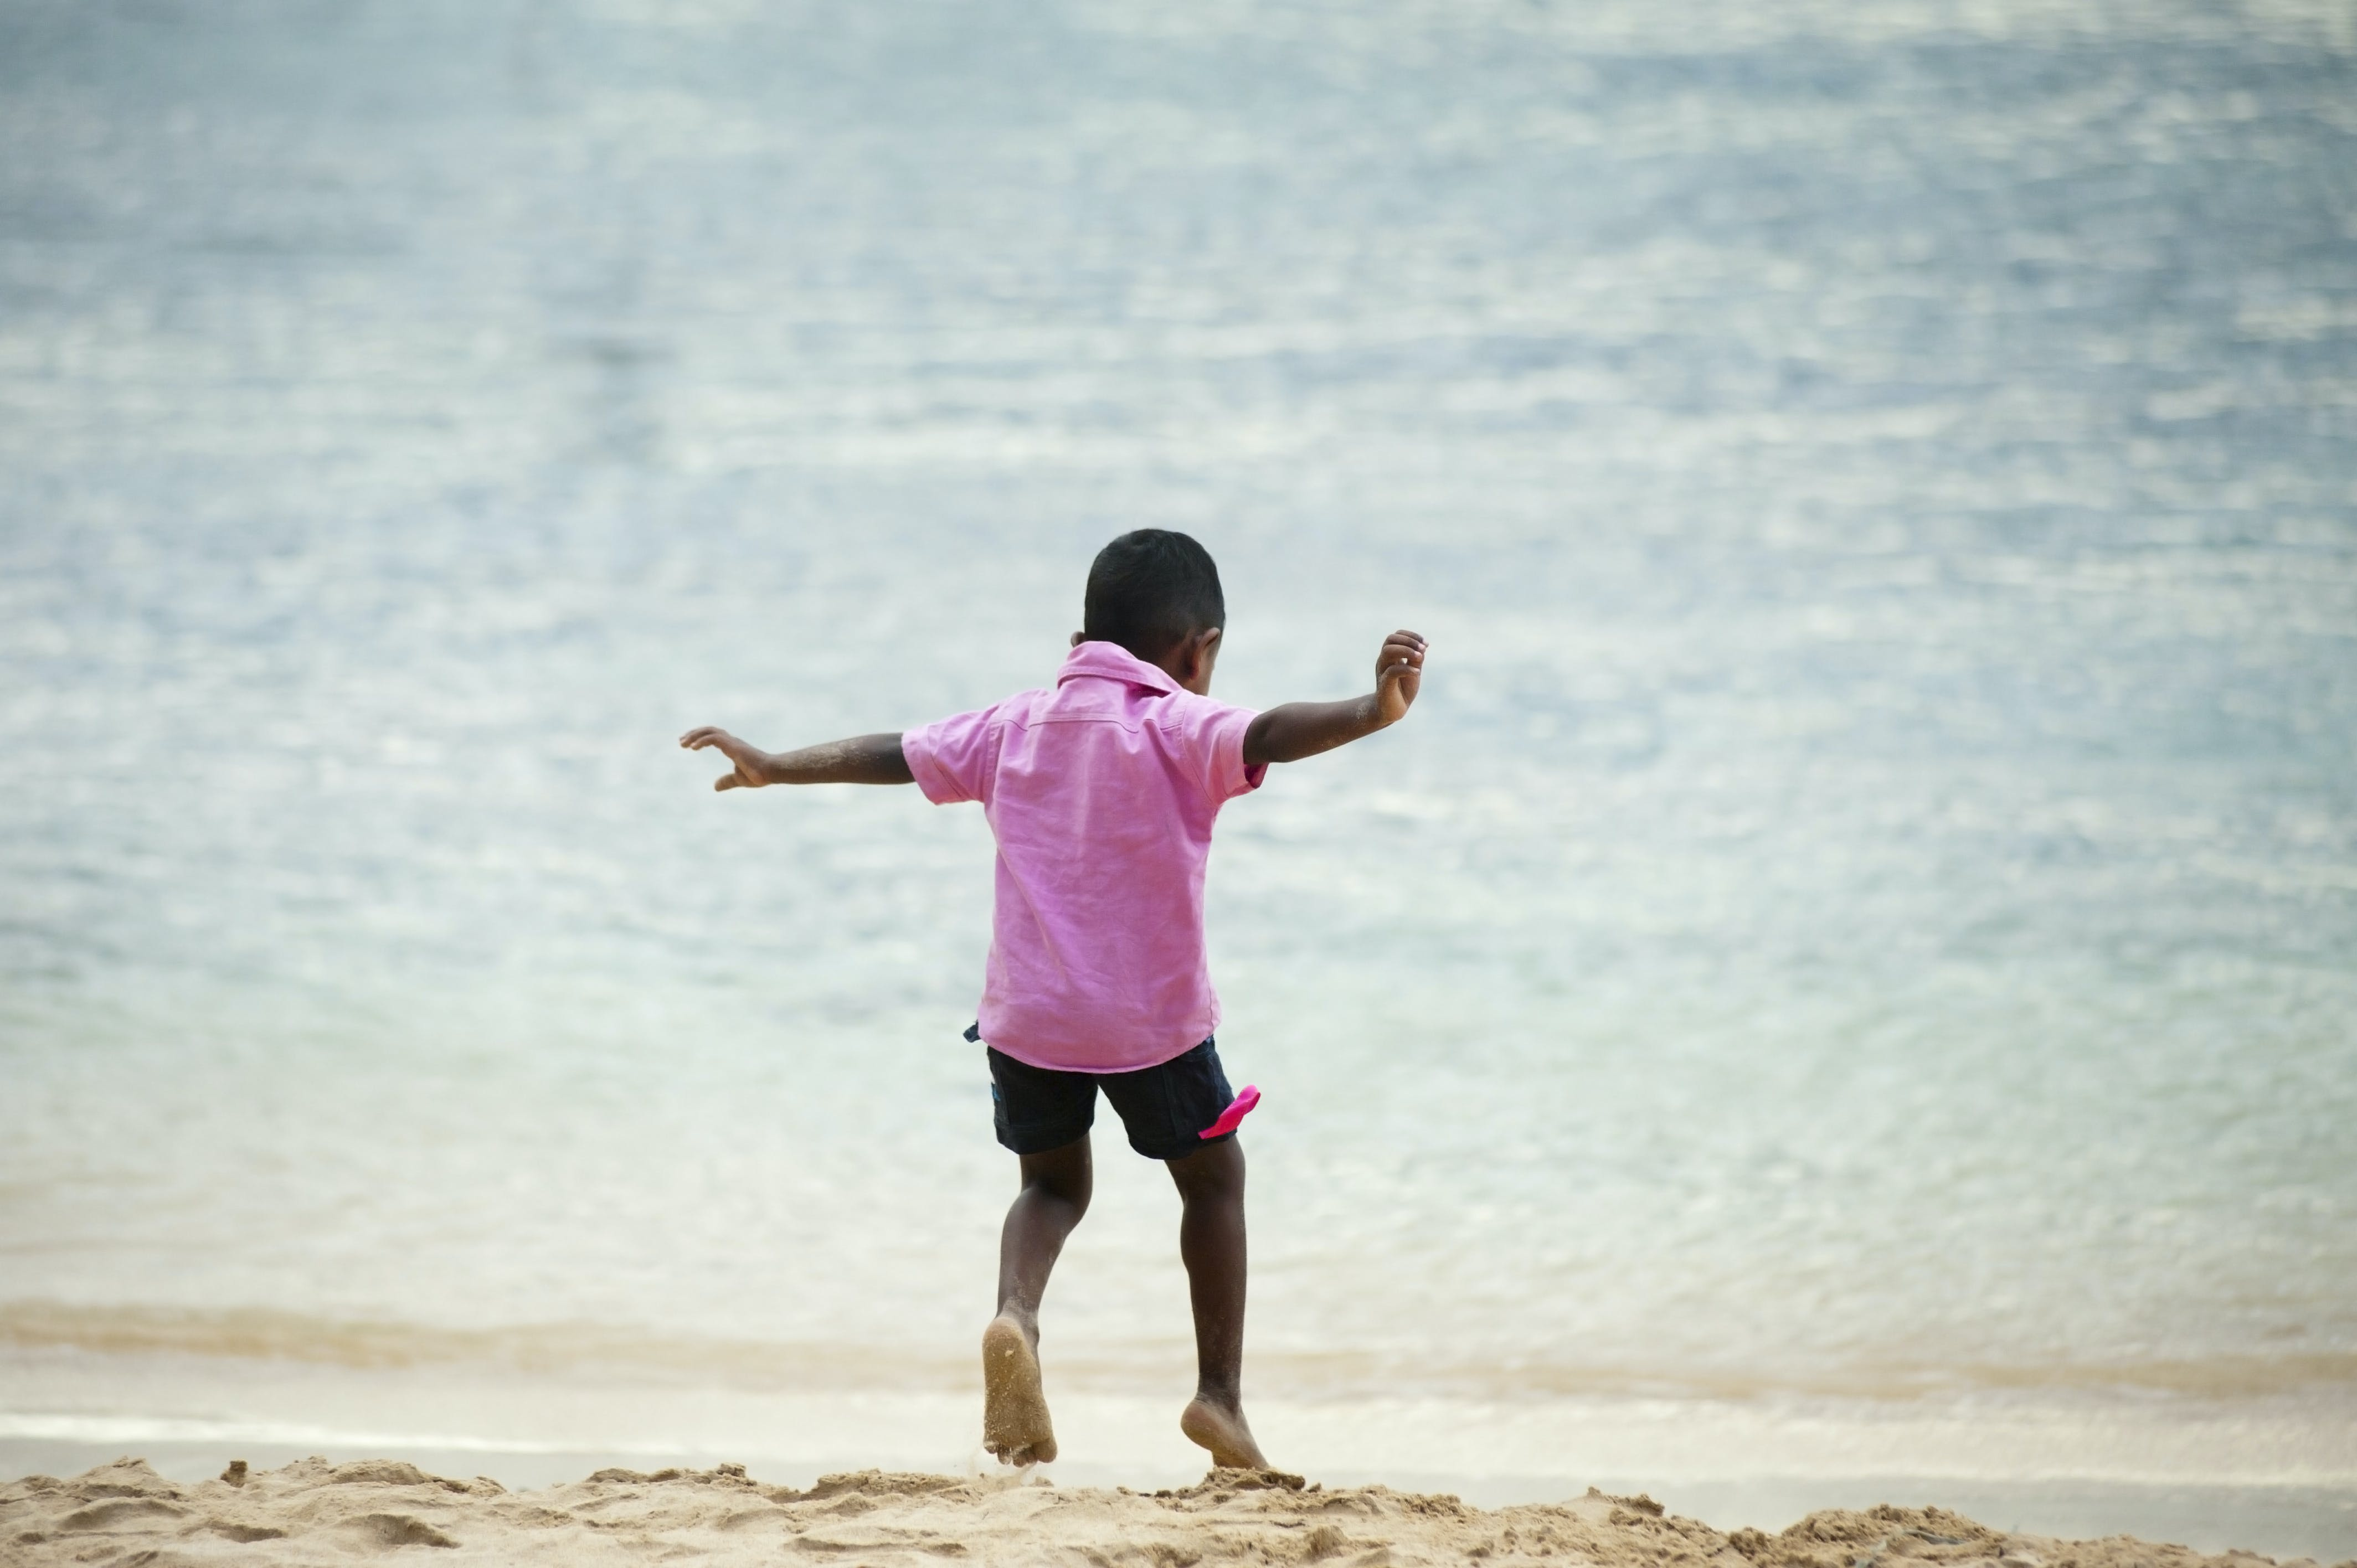 action, beach, boy